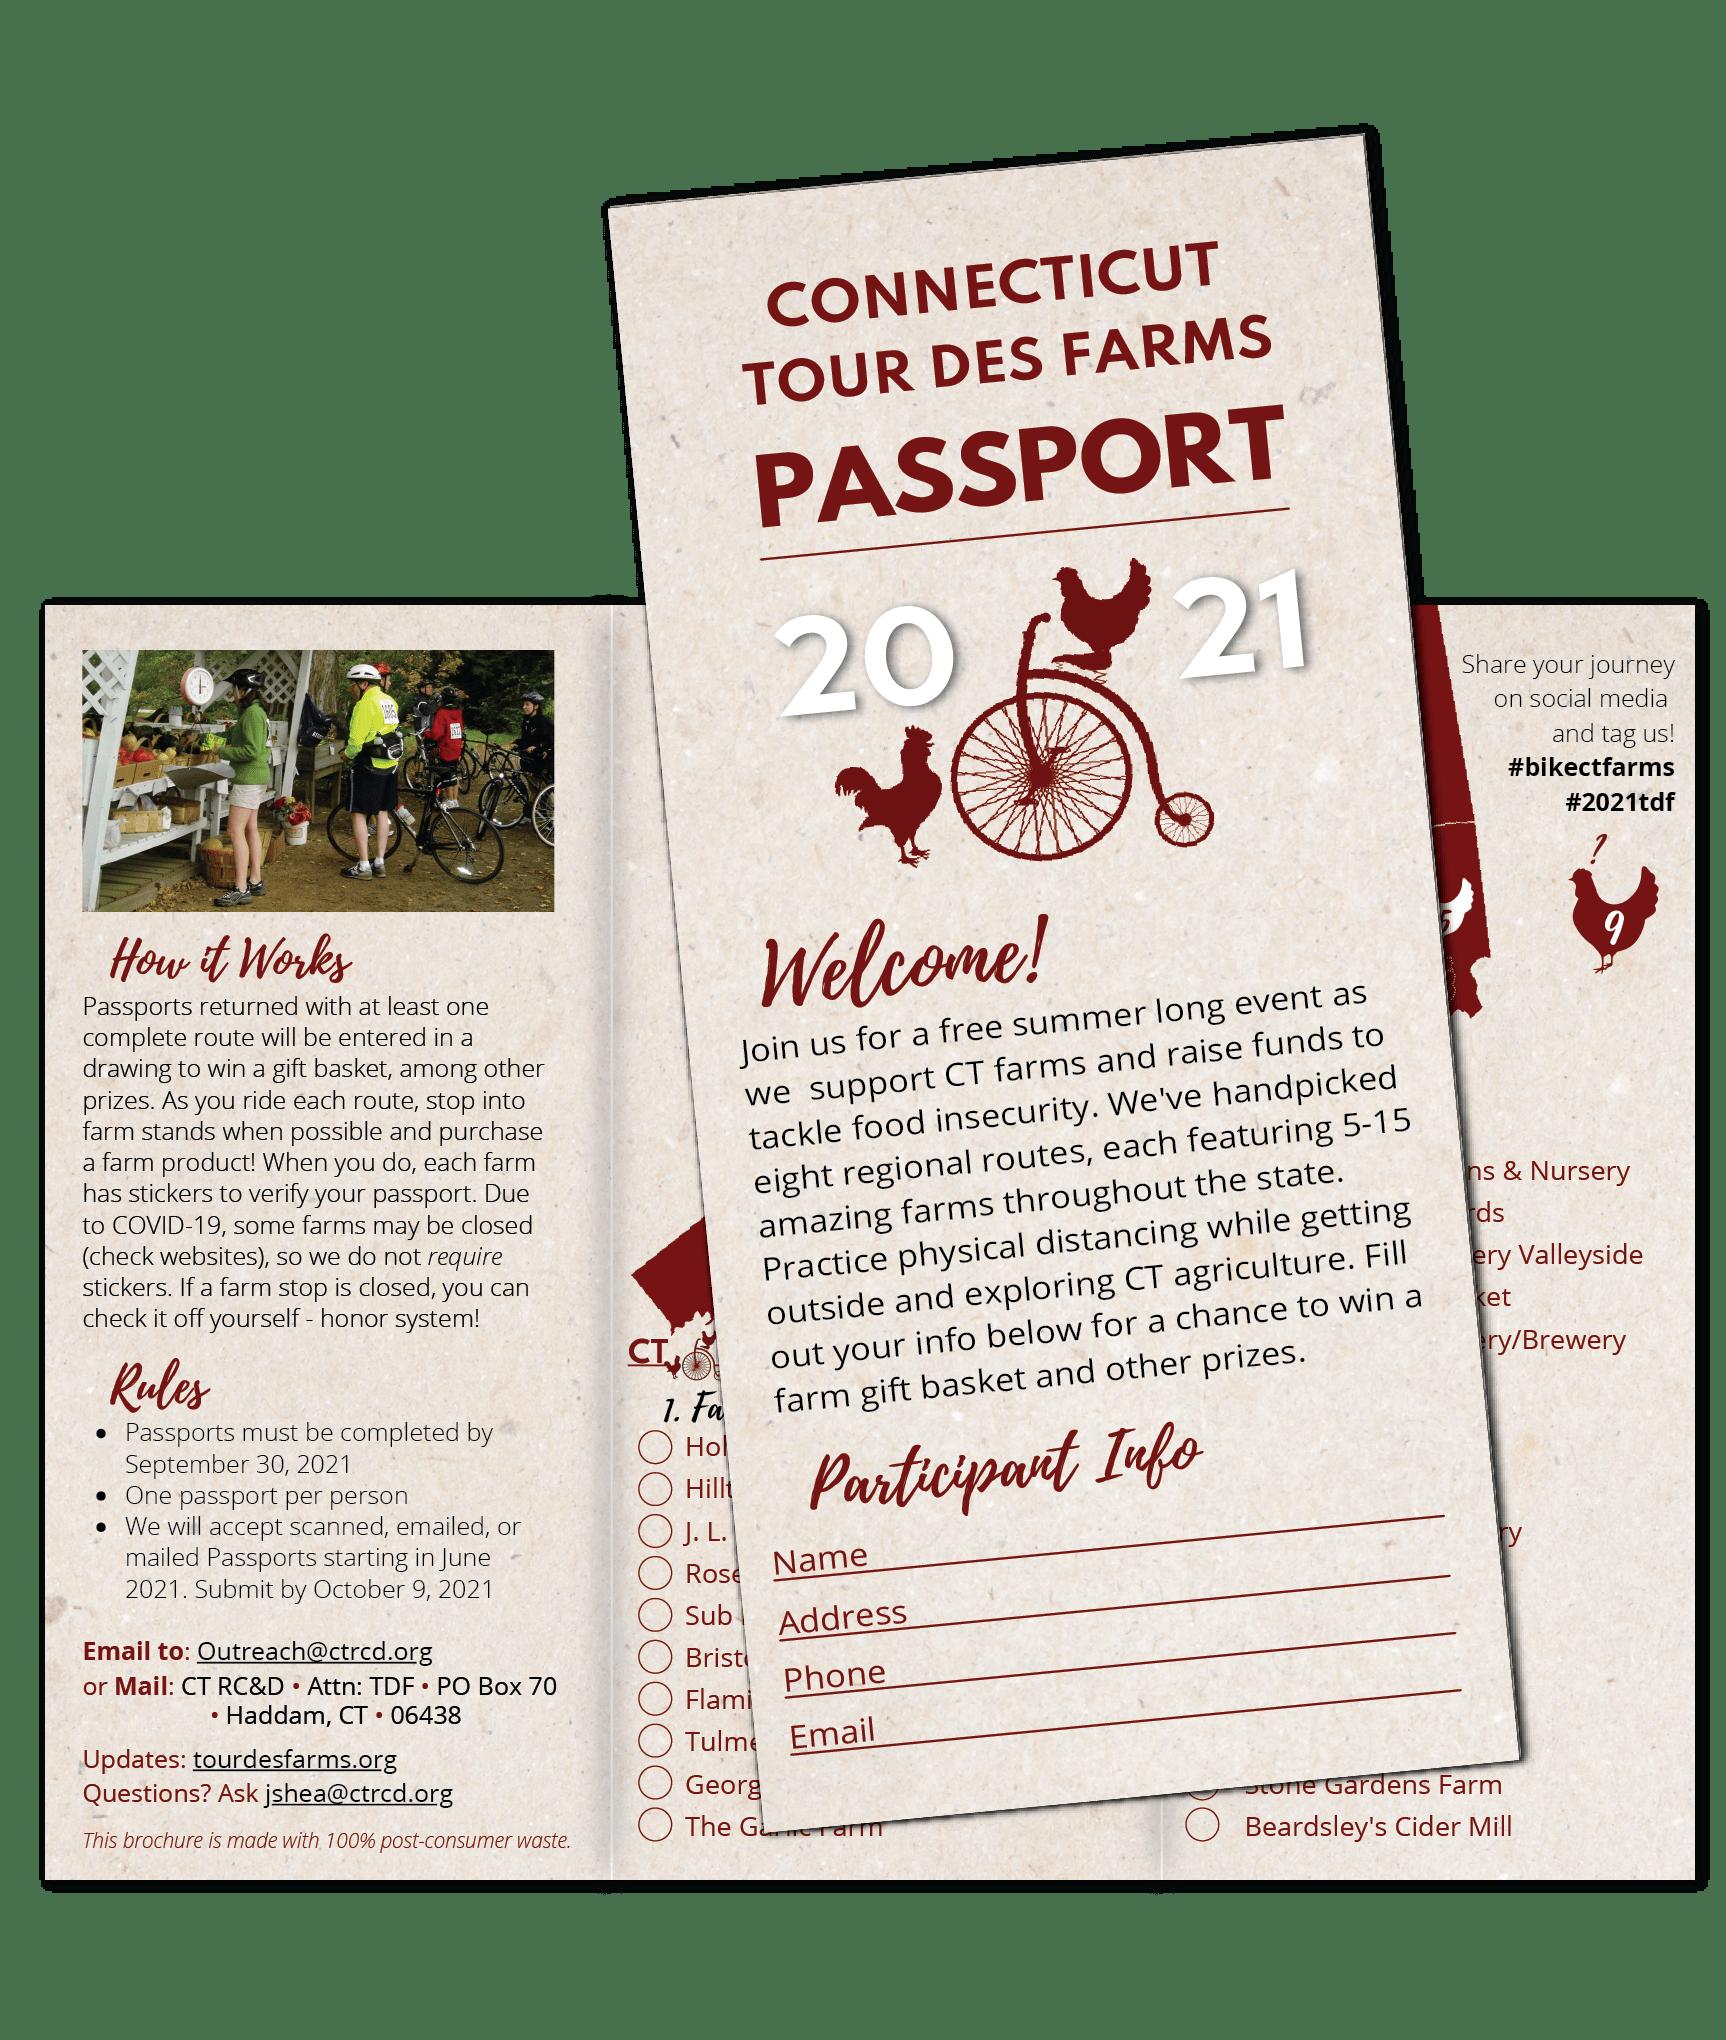 Passport-2021-TDF-01